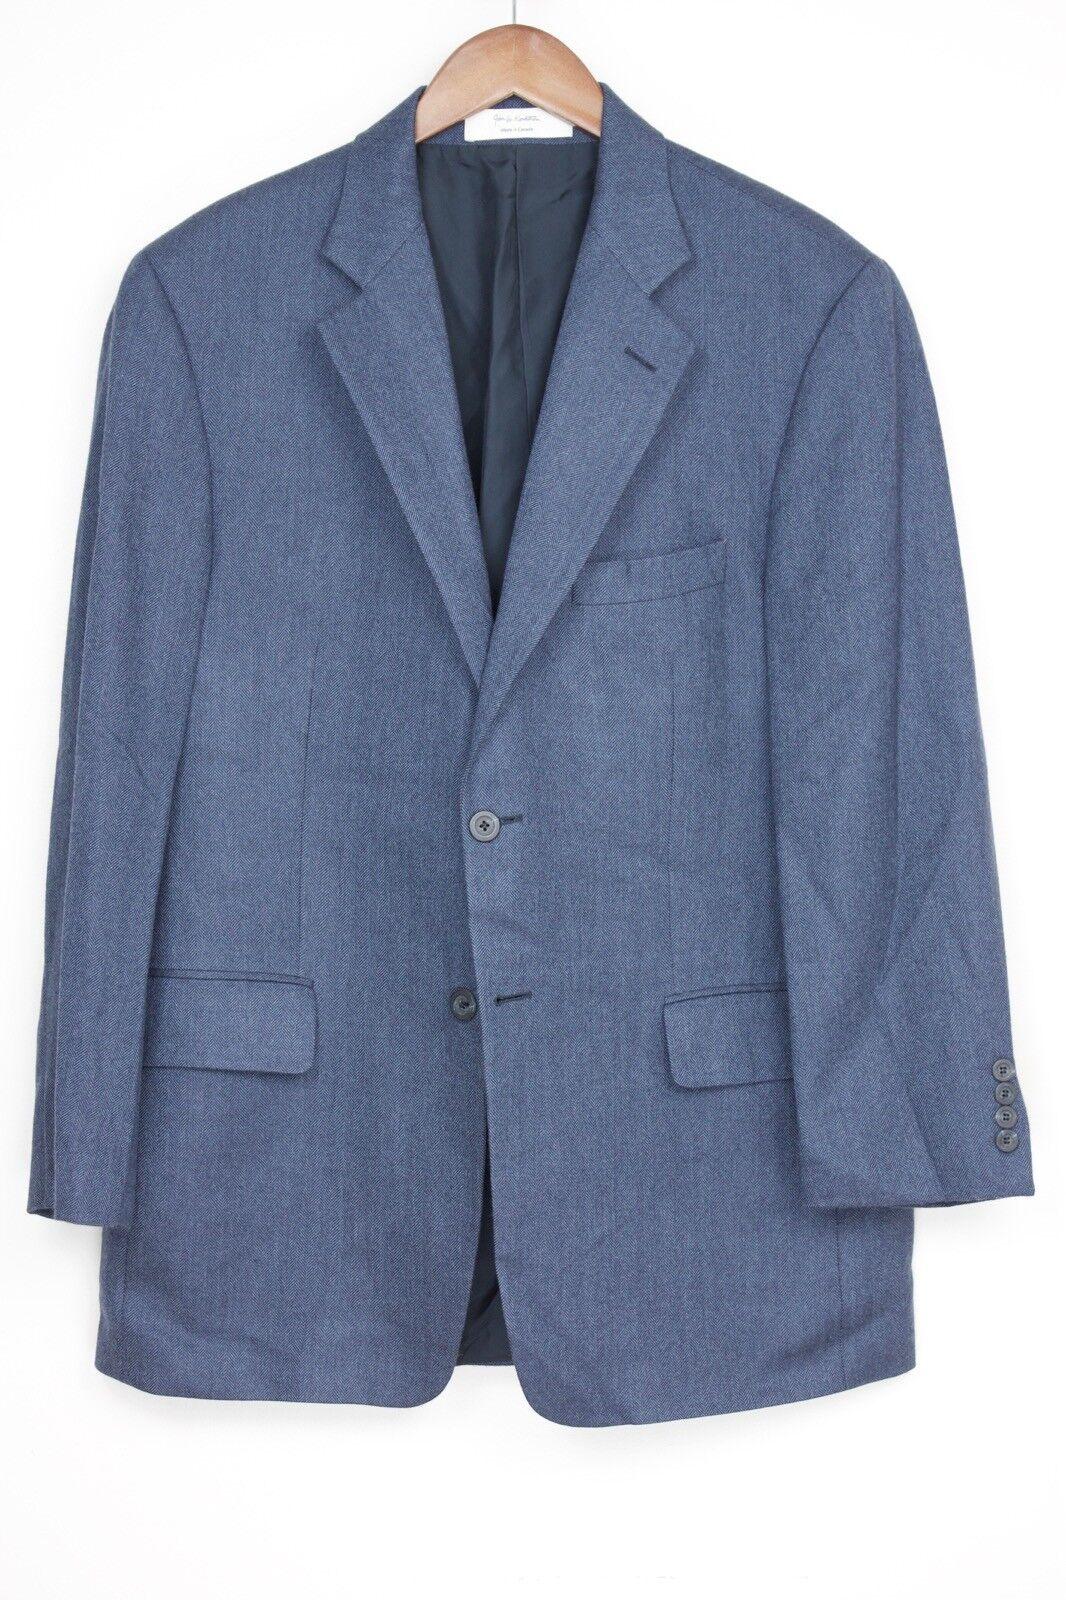 Nordstrom herren Sport Coat 42R Solid Blau Herringbone LGold Piana Cashmere jacke